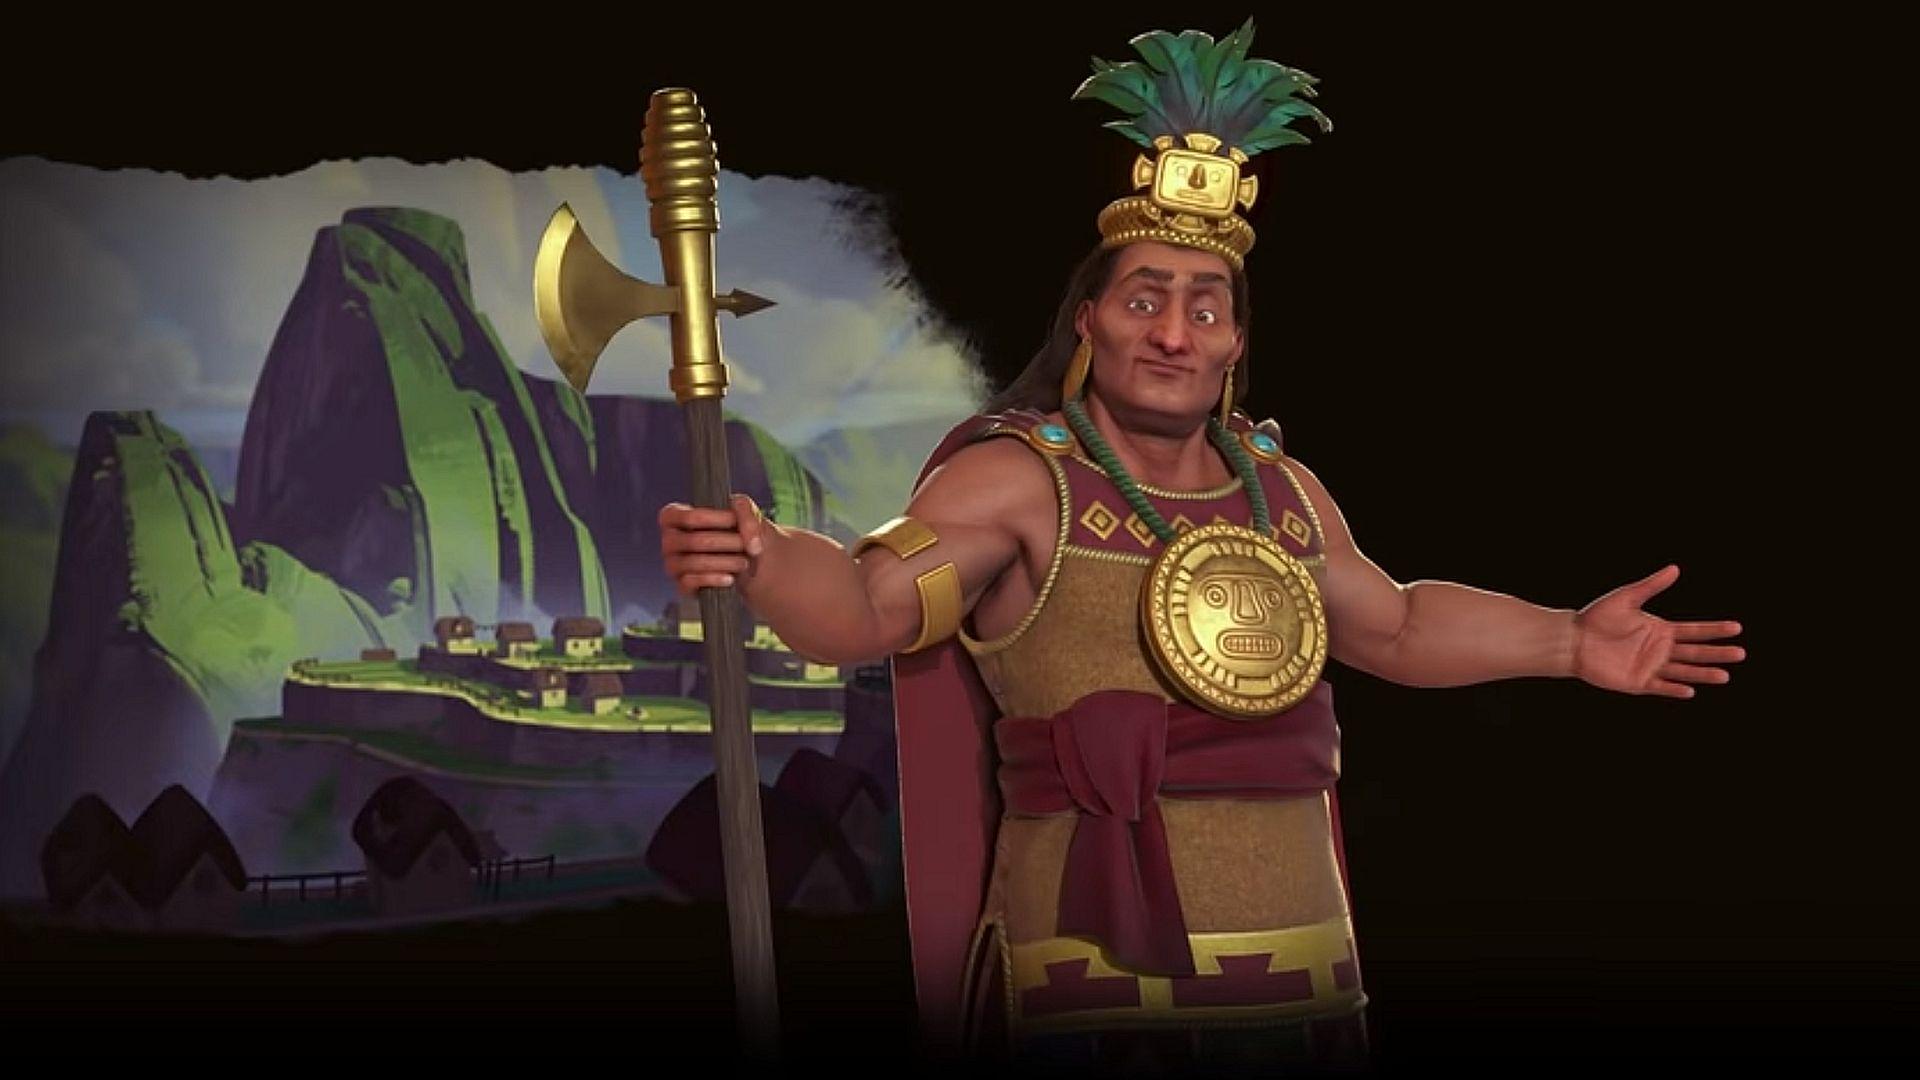 Cleopatra Civ Vi